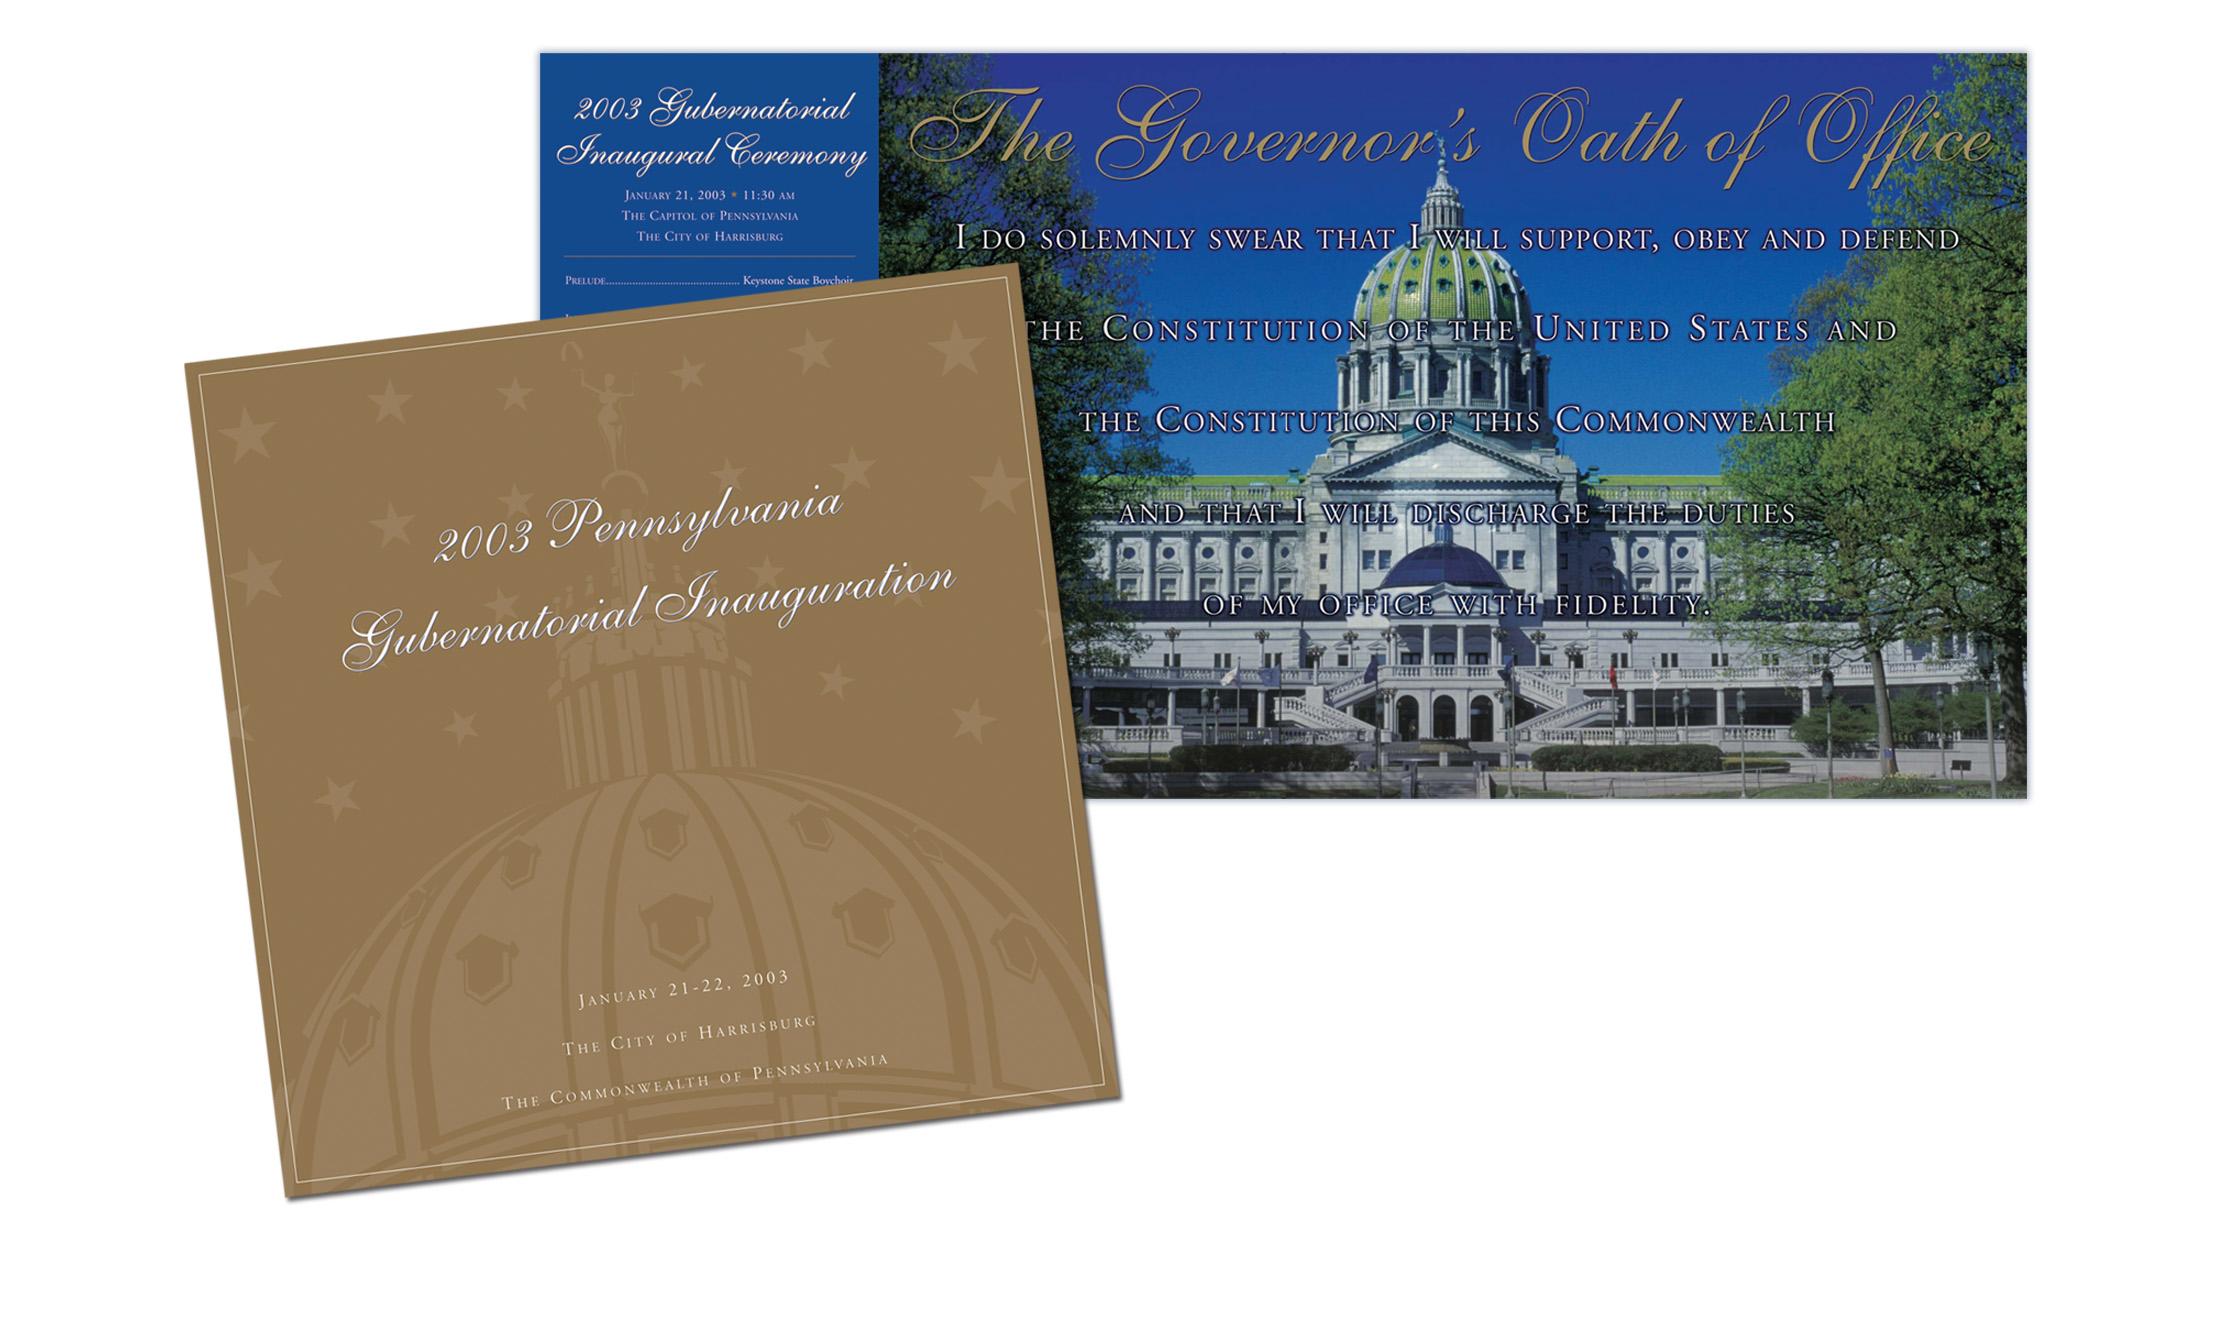 2003 PA Gubernatorial Inauguration Program